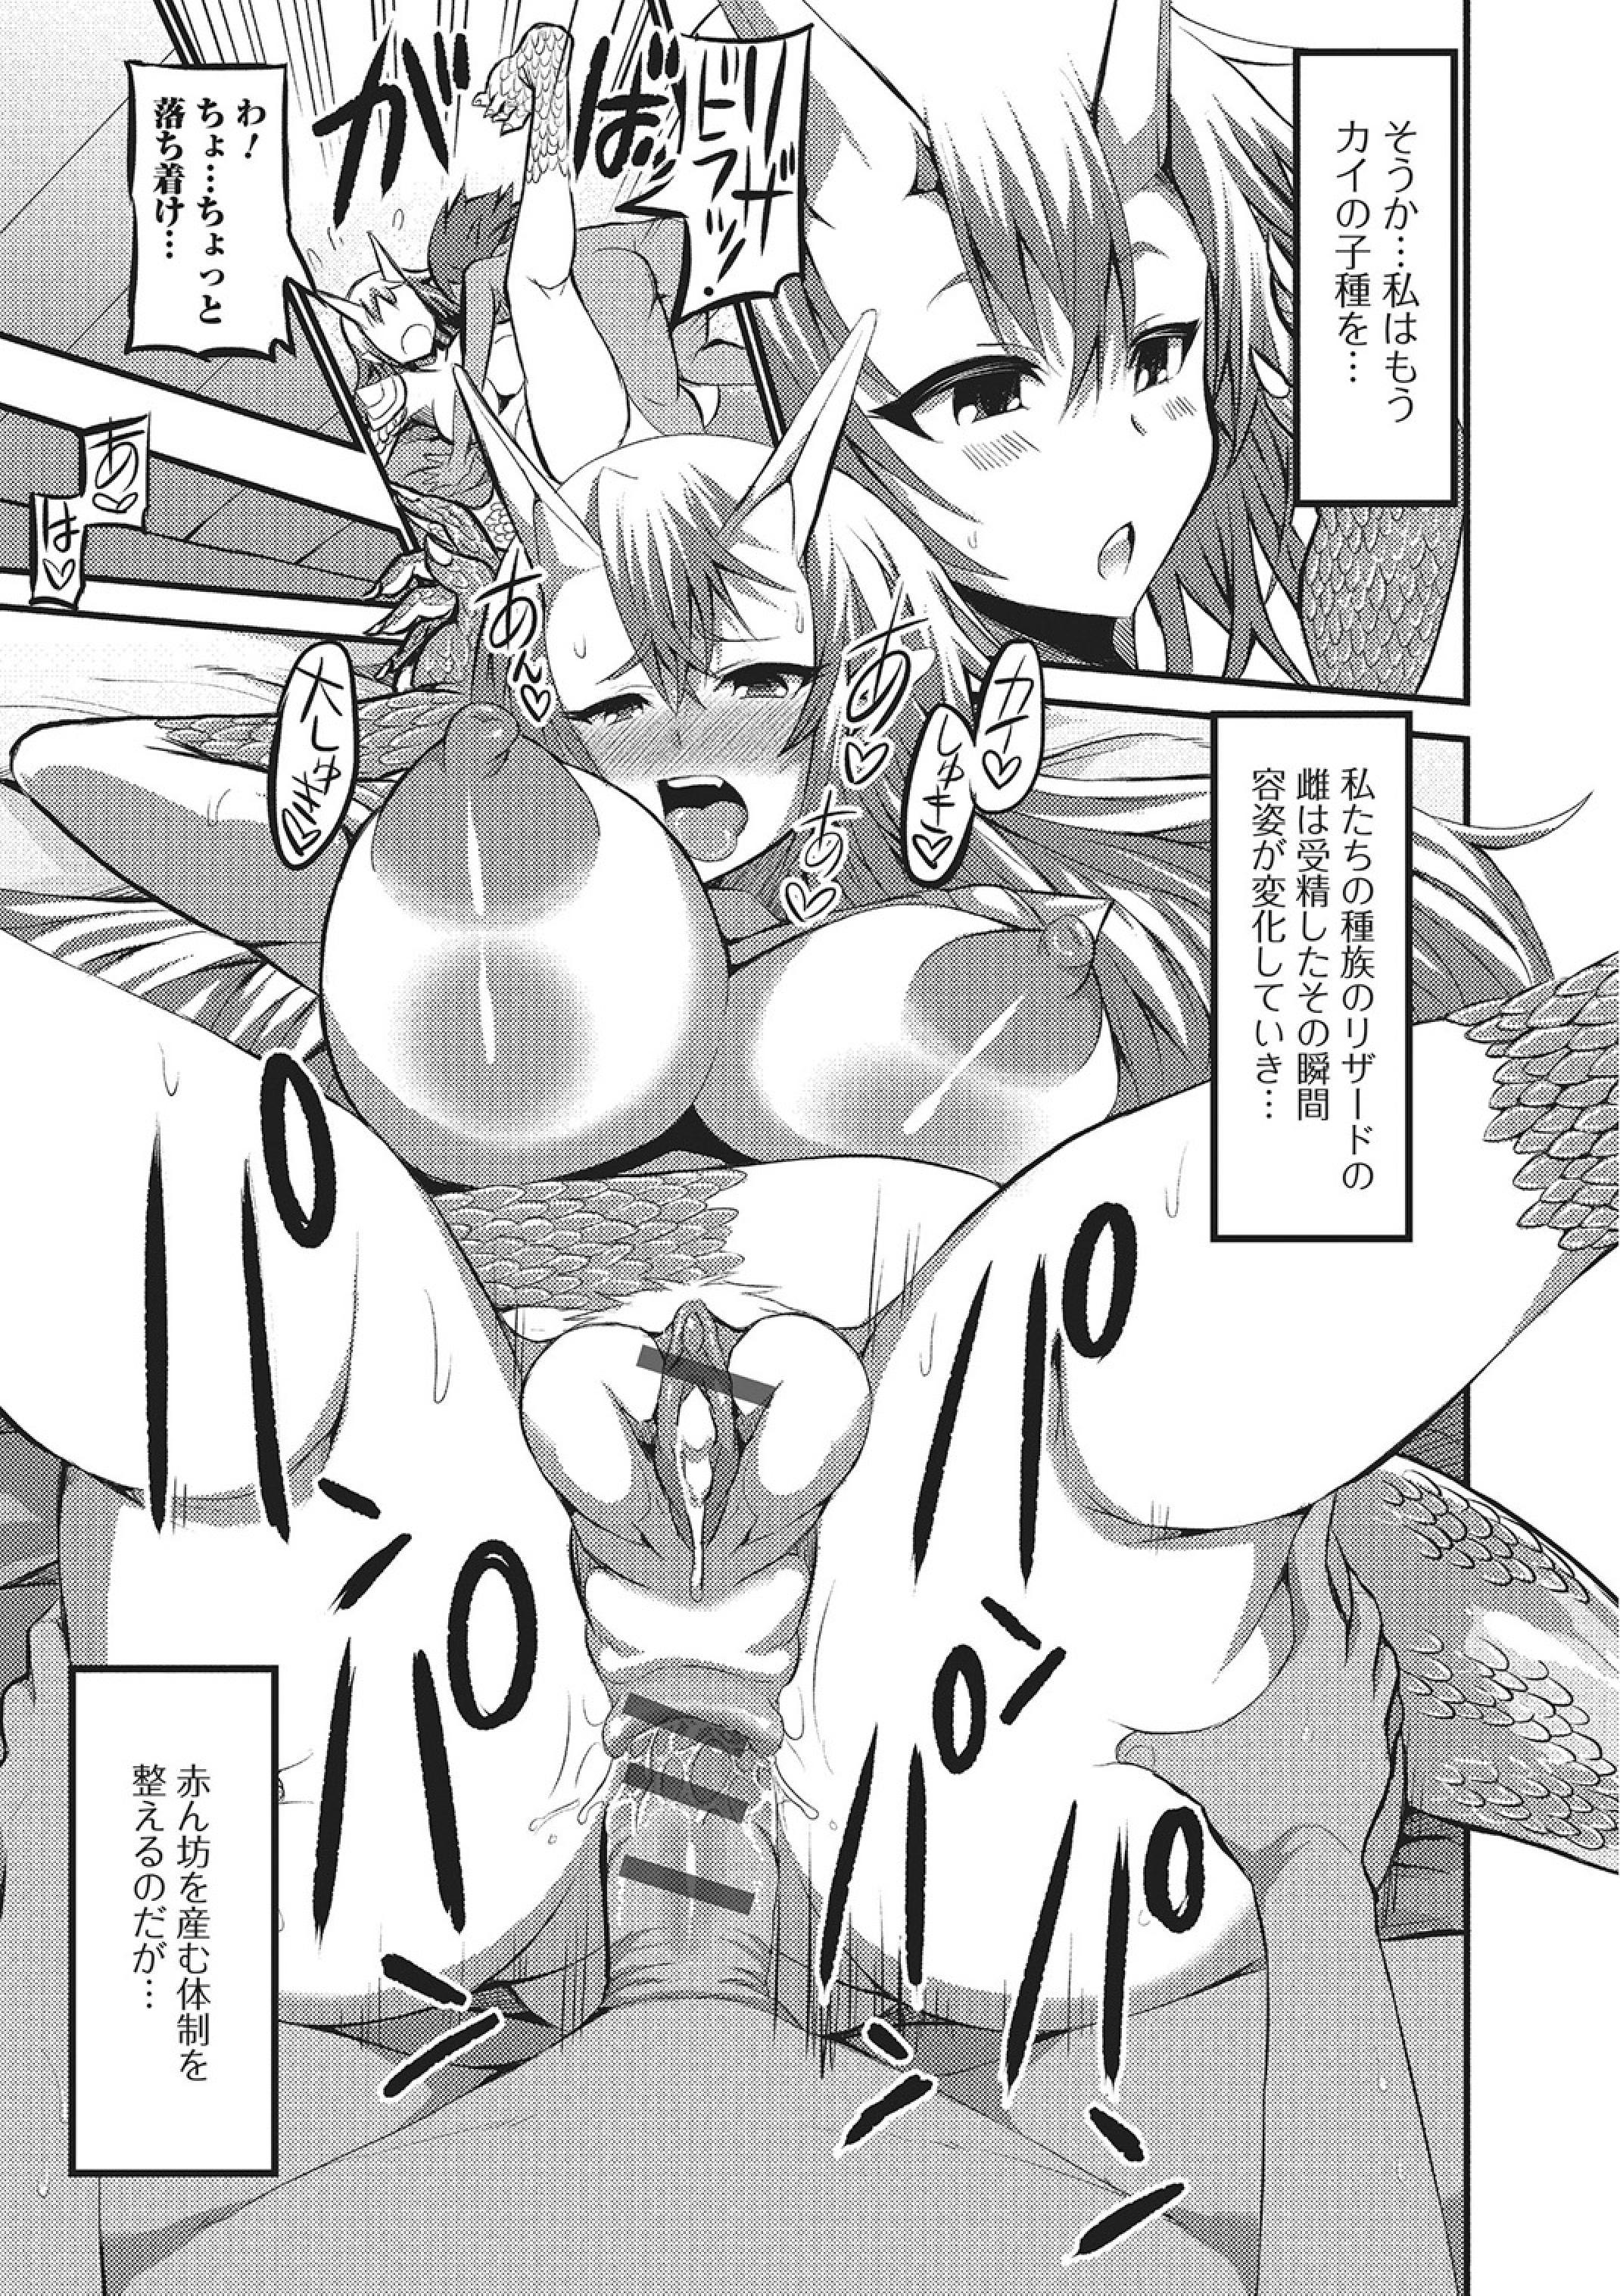 Monster Shoujo e no Yokujou 171